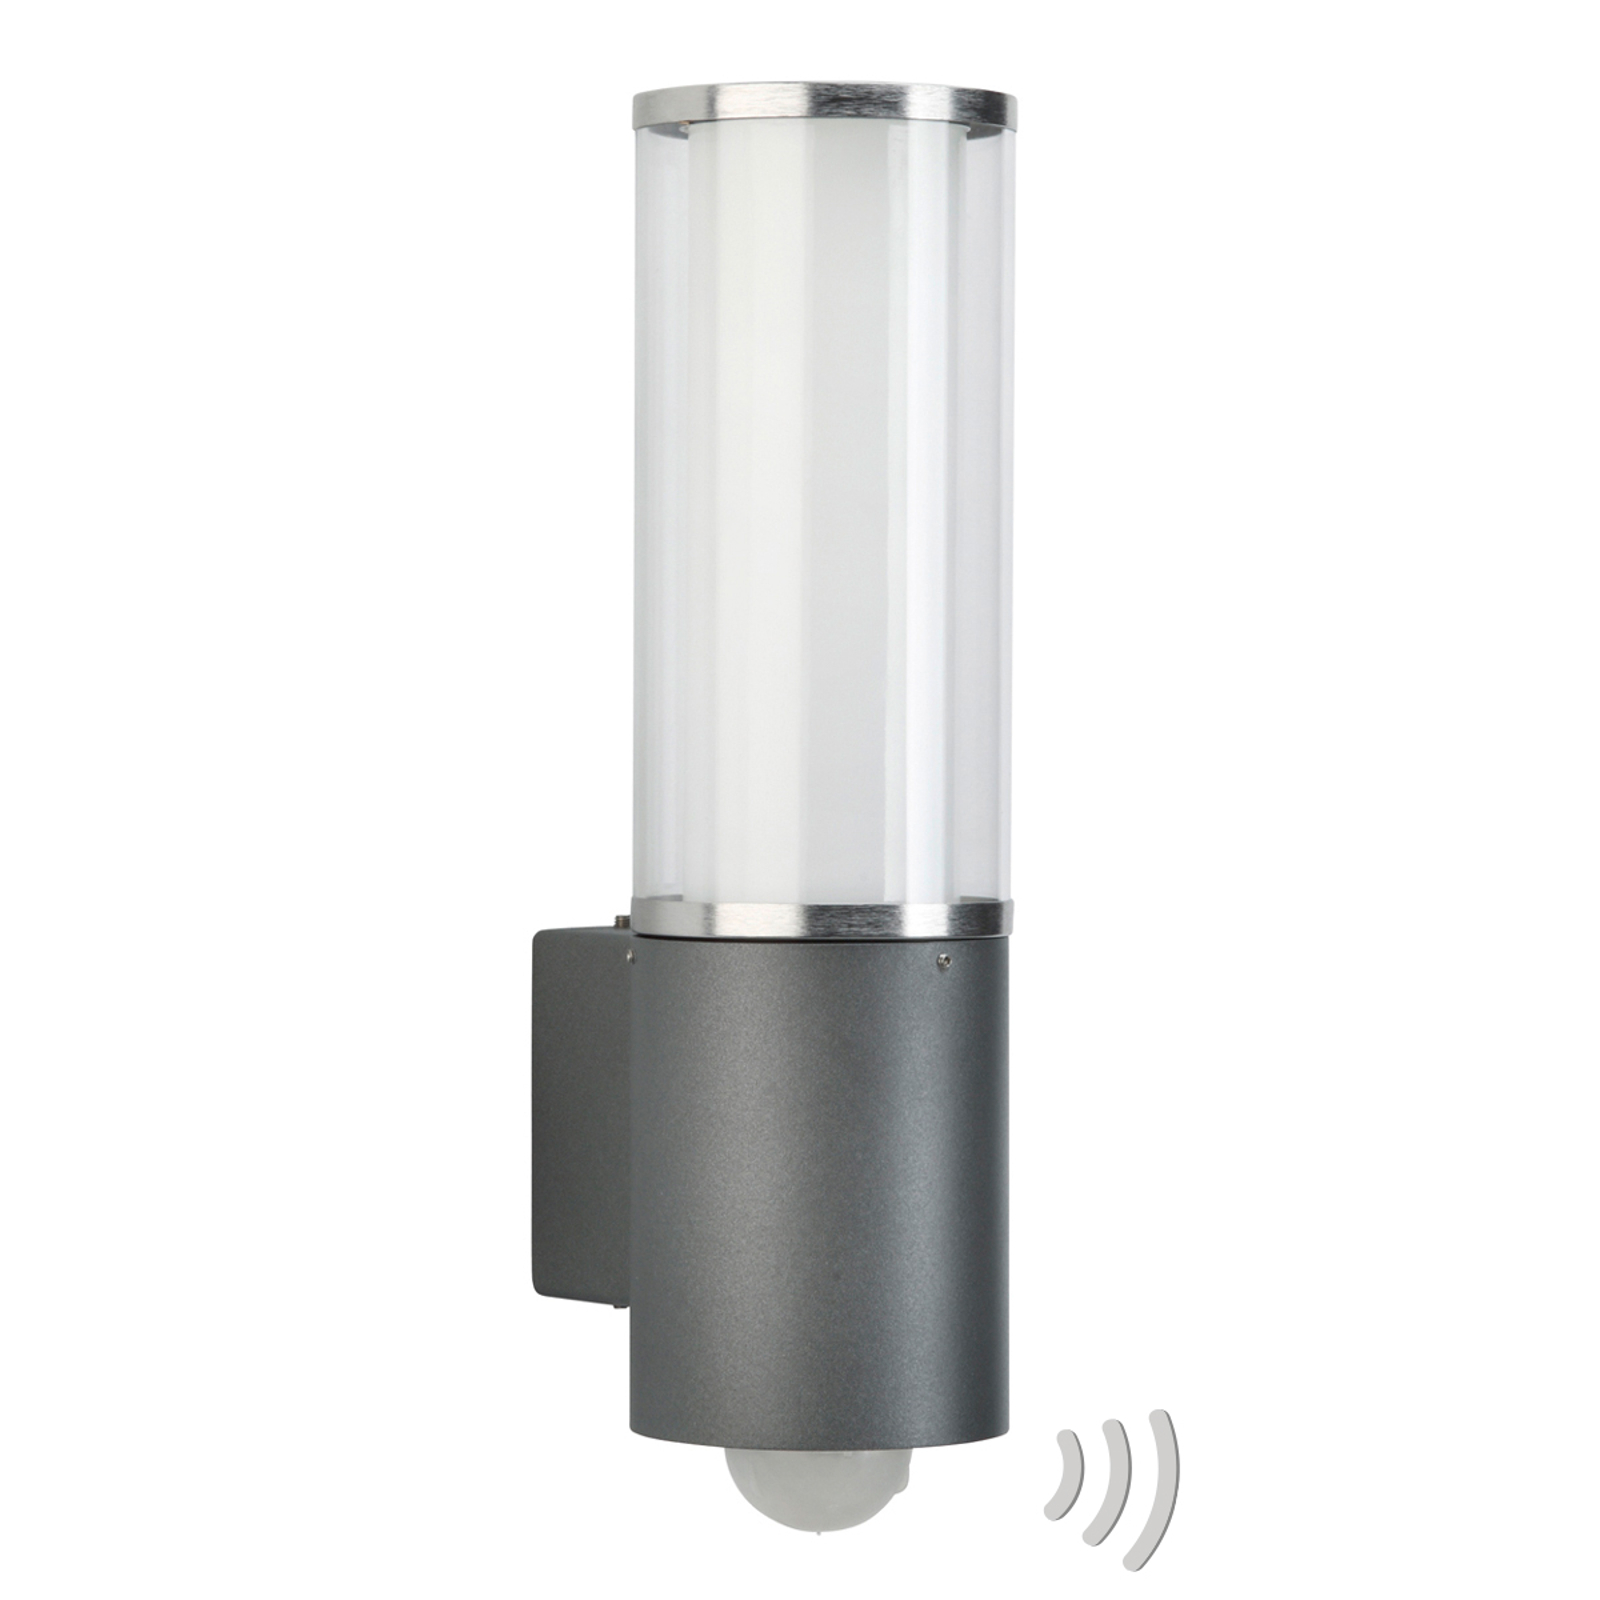 Buitenwandlamp Elettra met bewegingssensor